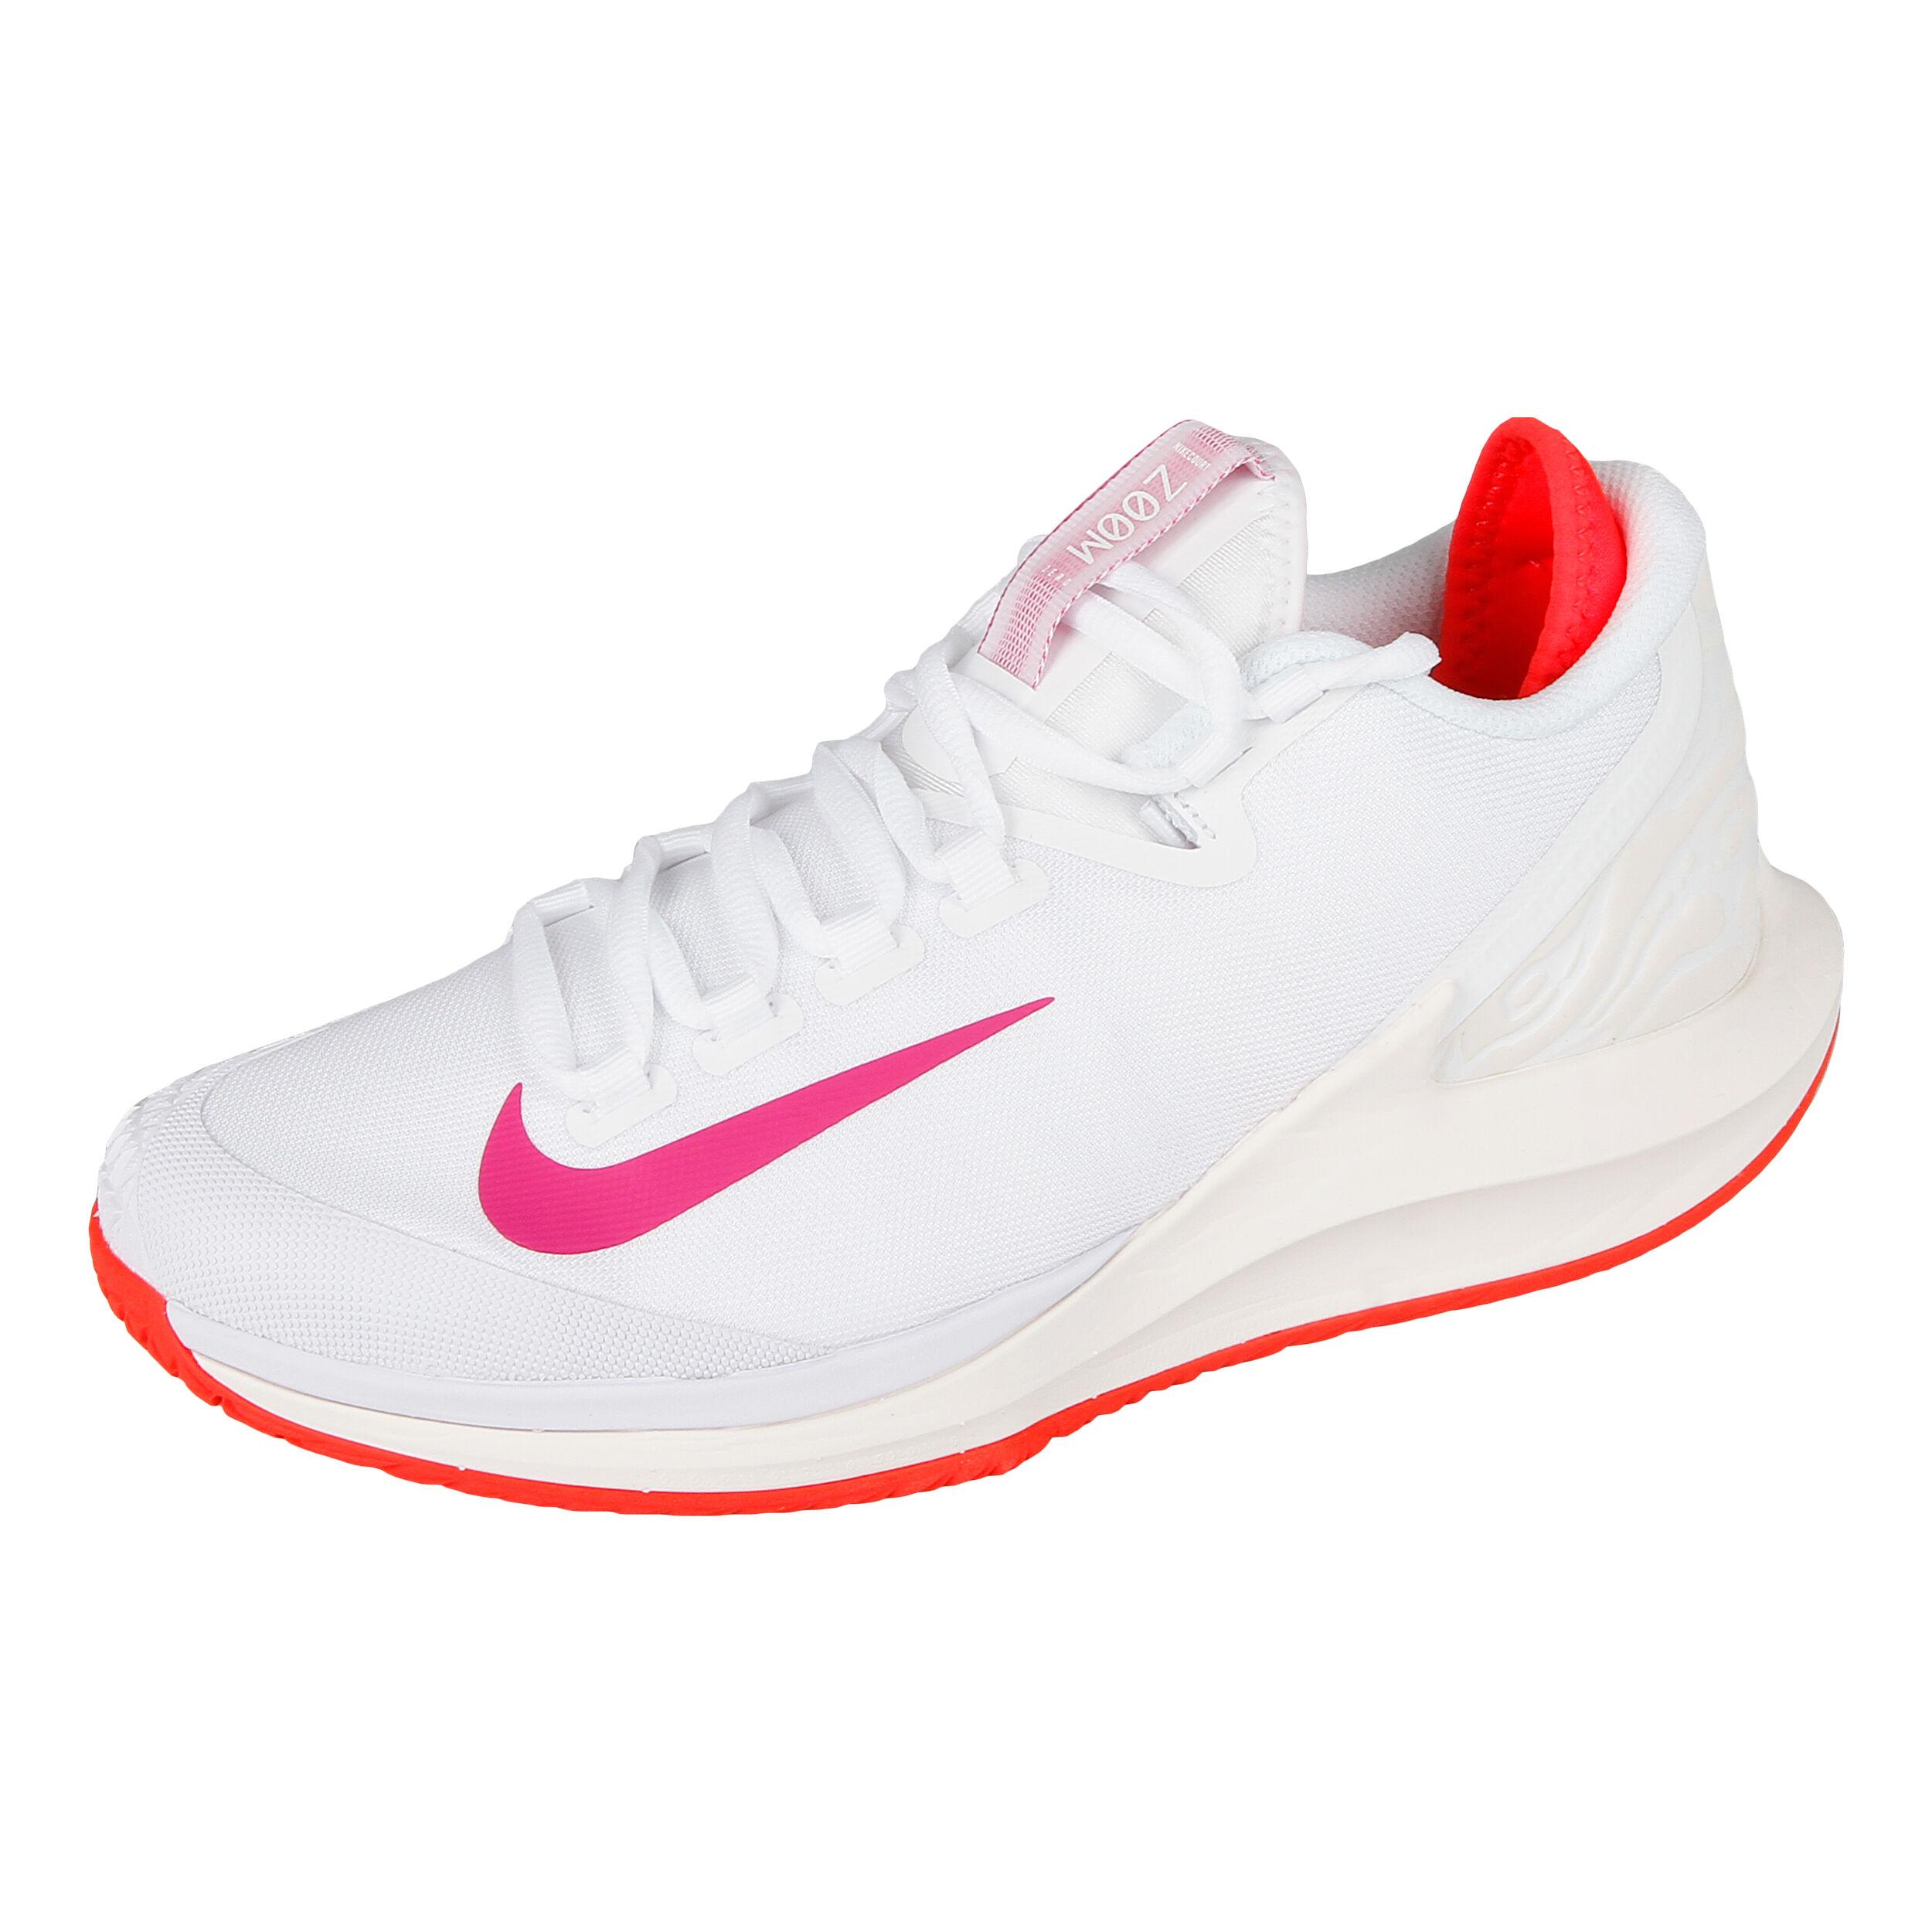 Nike Air Zoom Zero Chaussures Toutes Surfaces Femmes Blanc